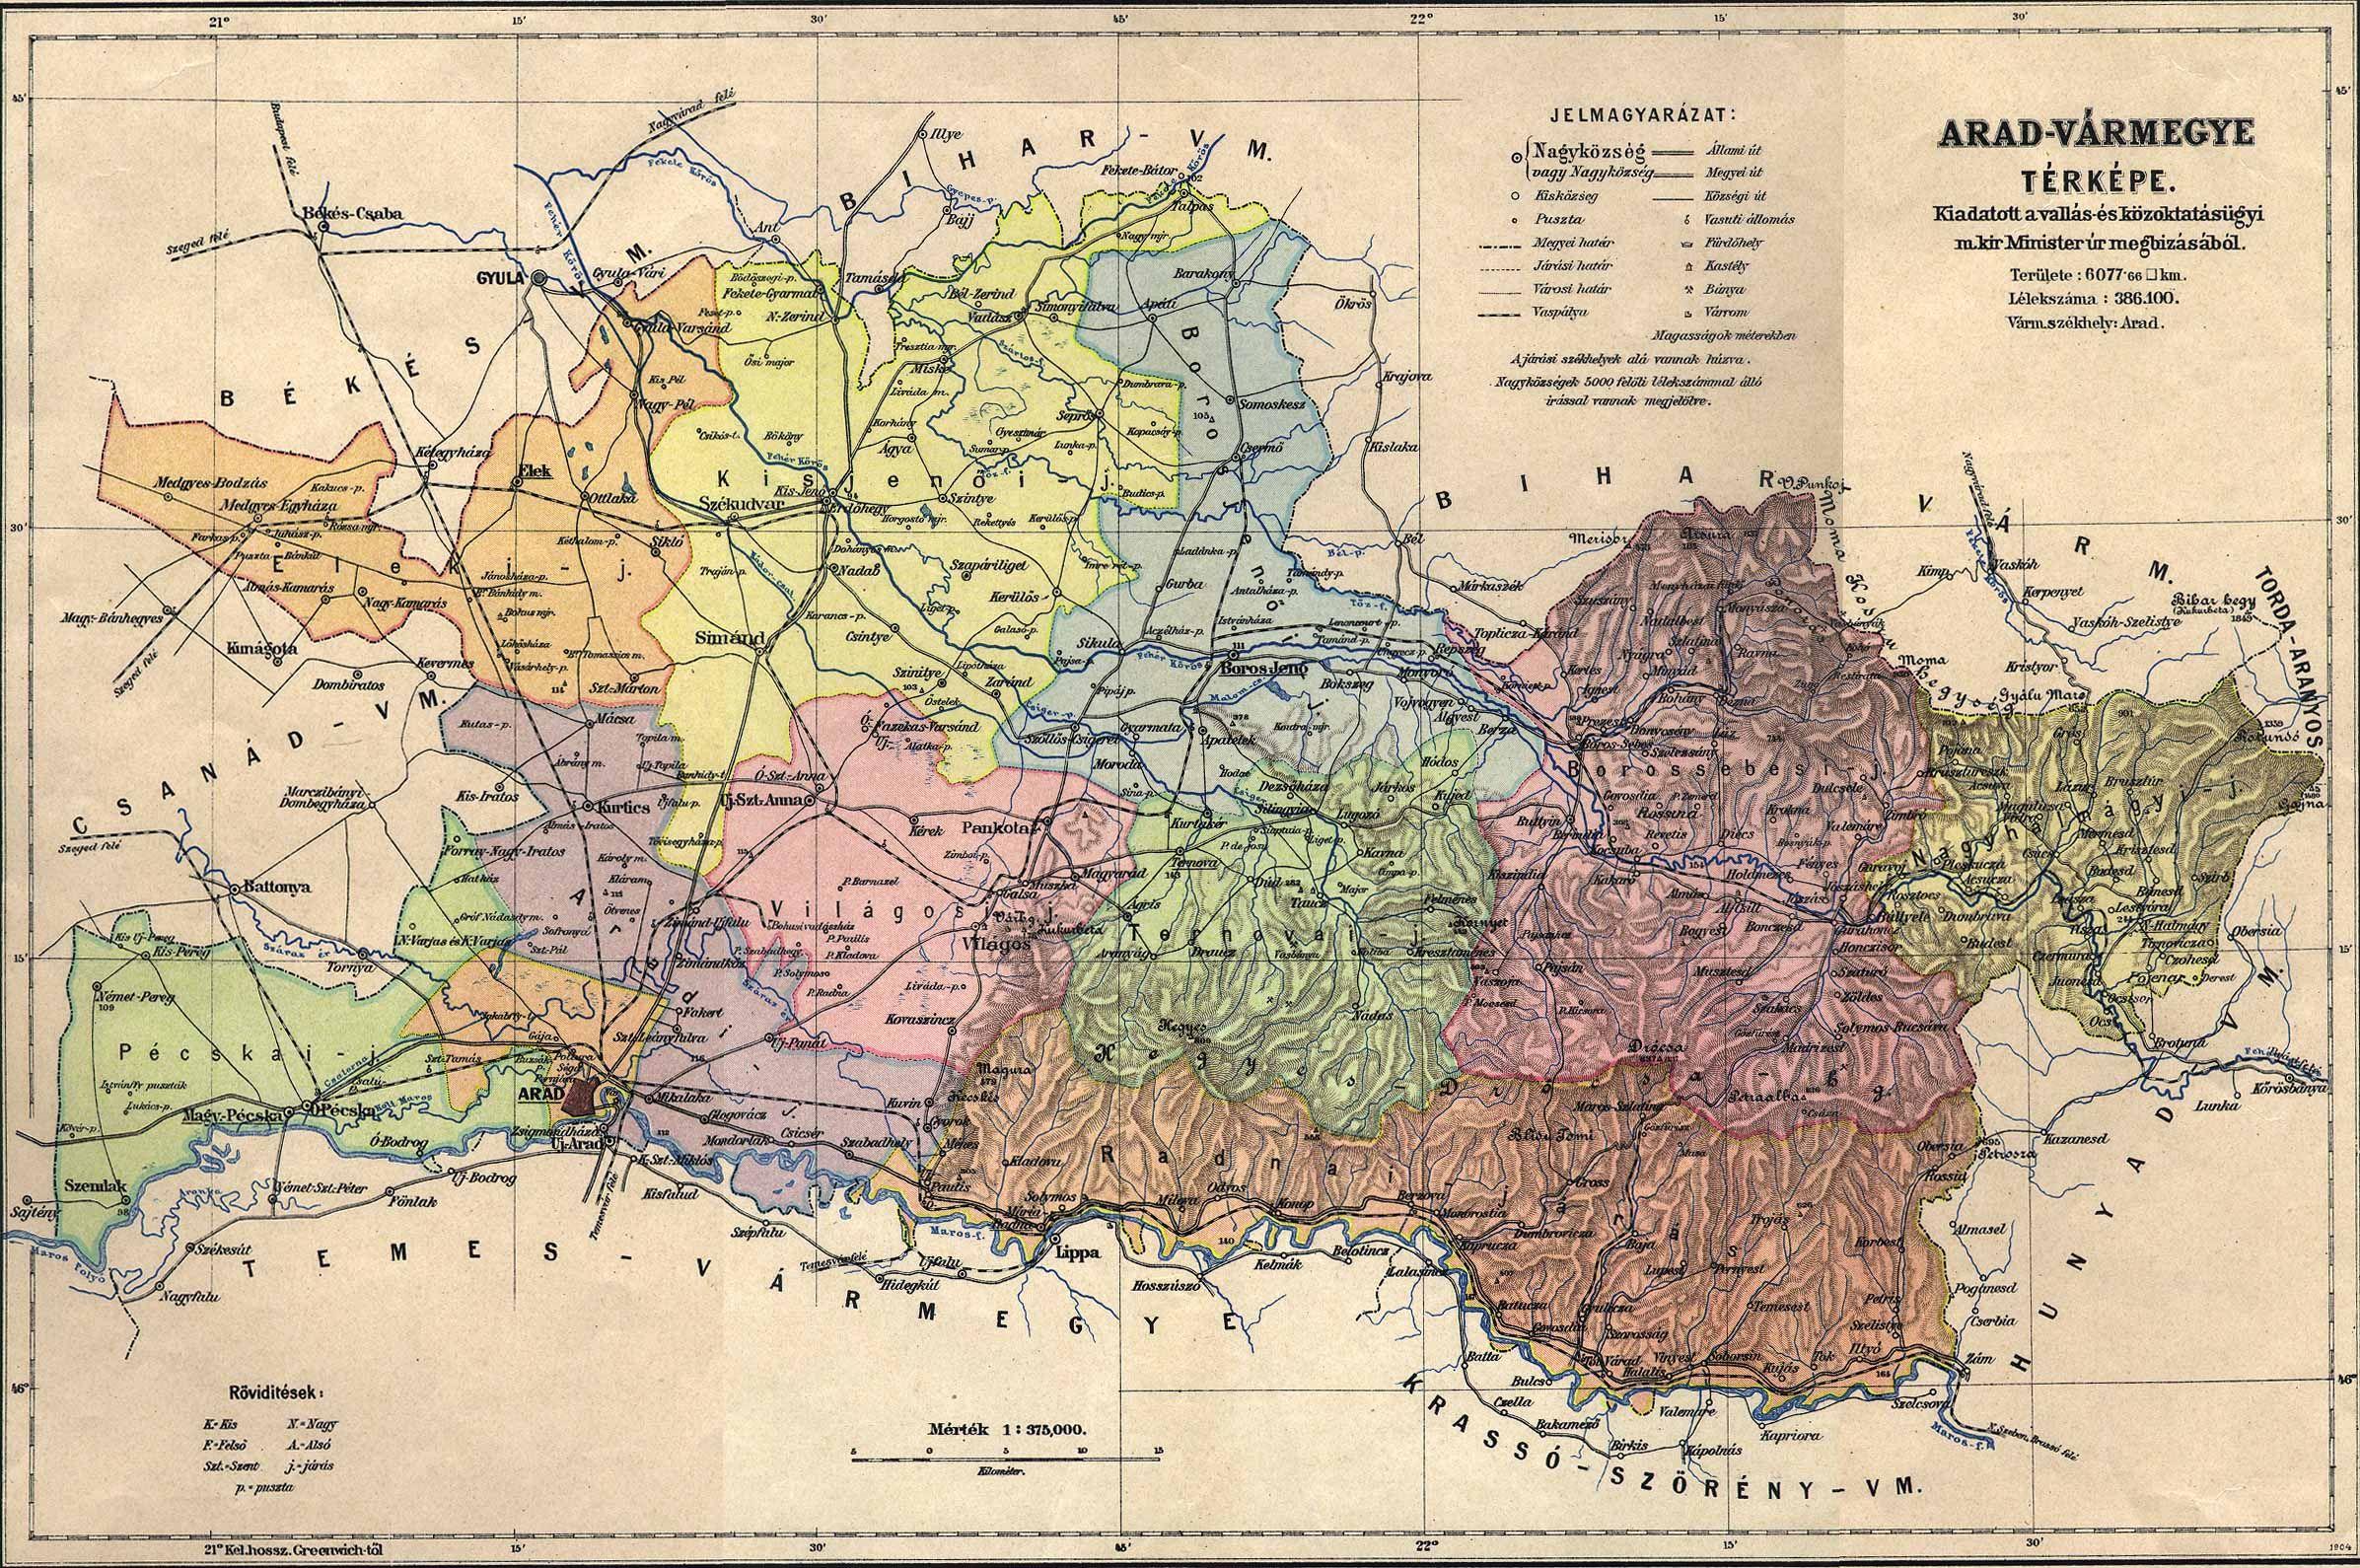 aradjpg 23931590 Old mapes Rgi trkpek Pinterest